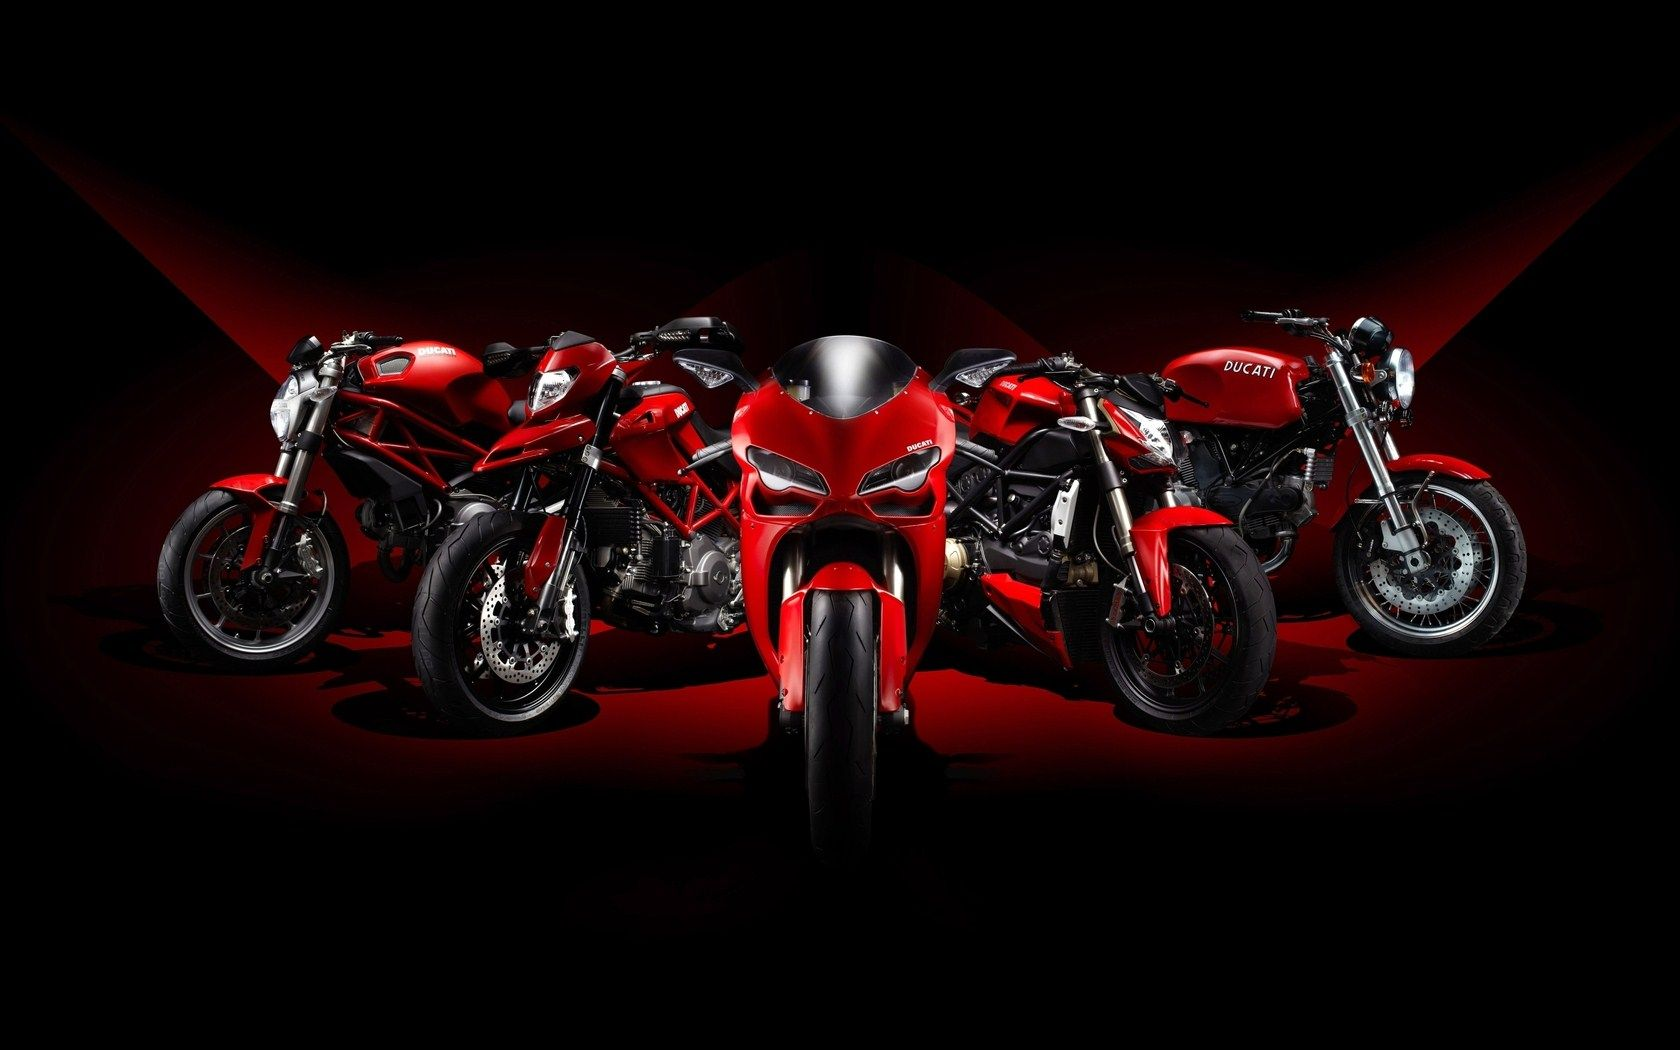 Ducati Bikes Best Images Hd Motorrad Ducati Motorrad Fahren